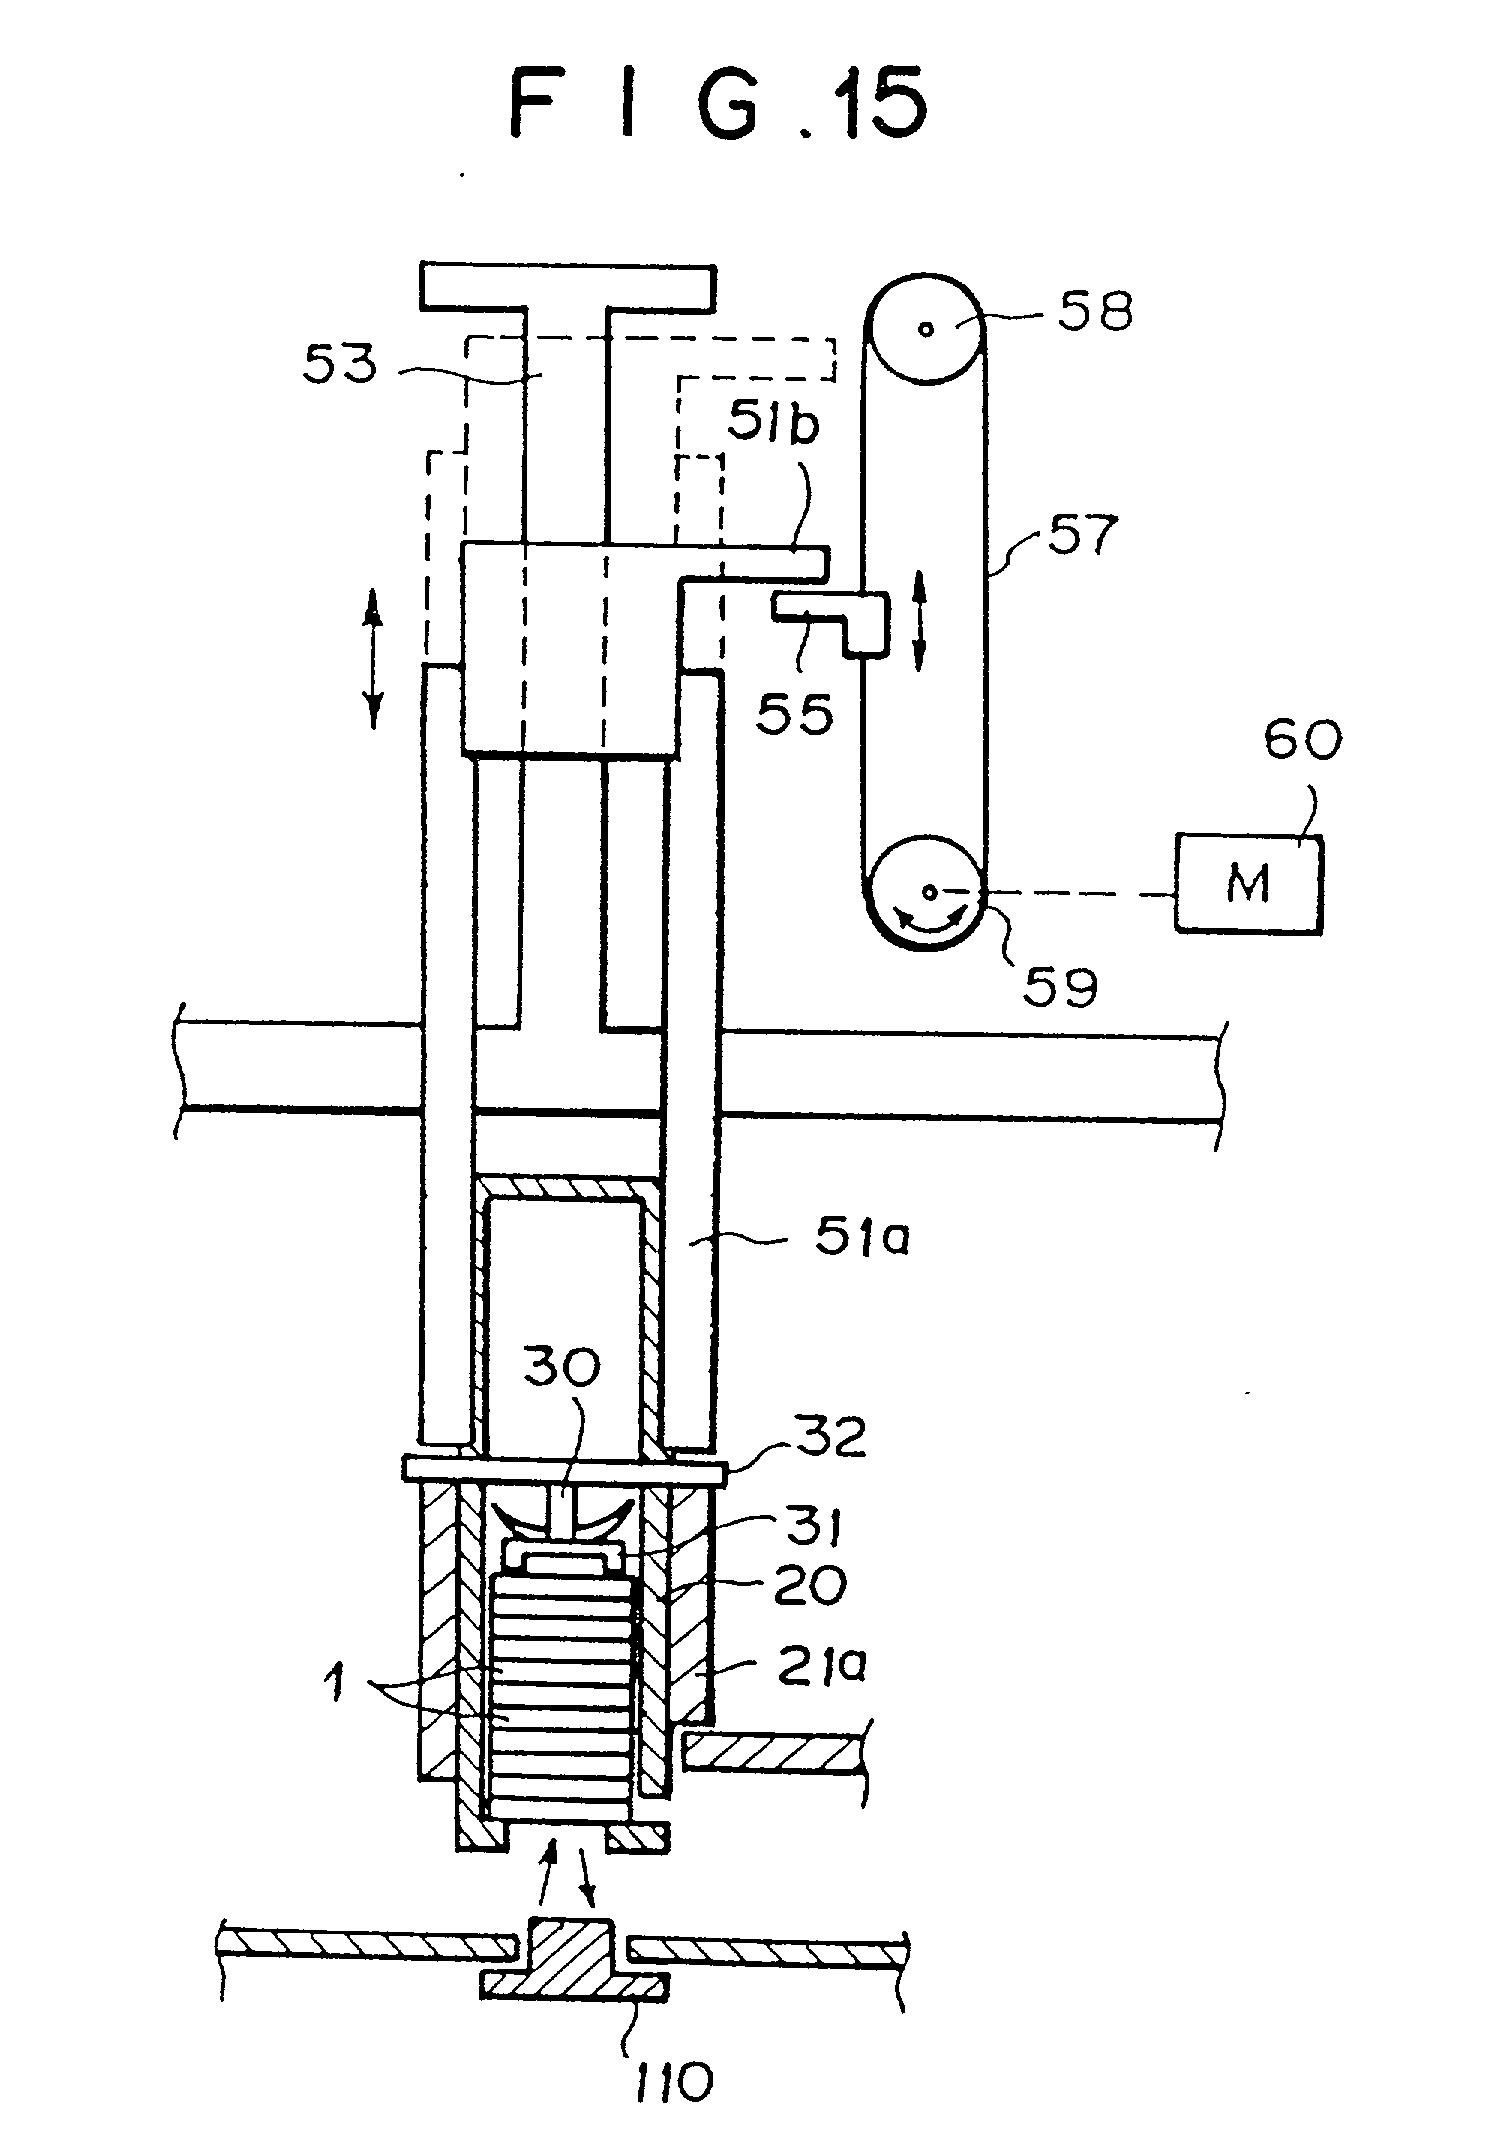 methods of chemical analysis Standard methods of chemical analysis vol 1, the elements n howell furman,  ed van nostrand, princeton, nj, ed 6, 1962 xix + 1401 pp illus $25.